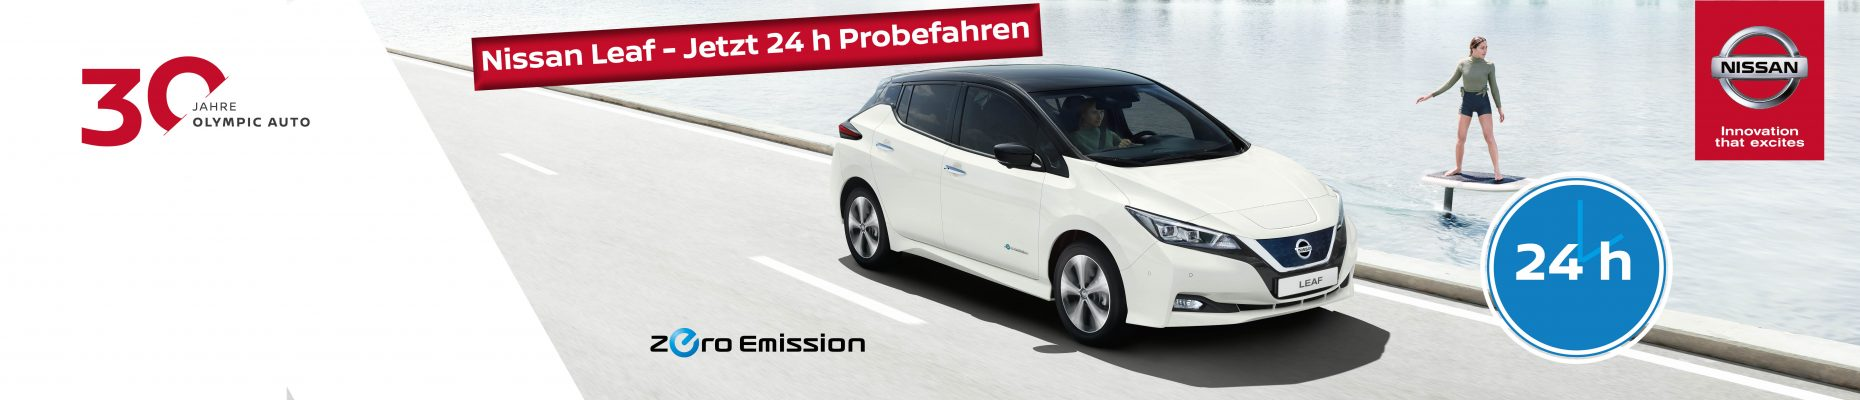 NISSAN Leaf - 24 h Probefahrt